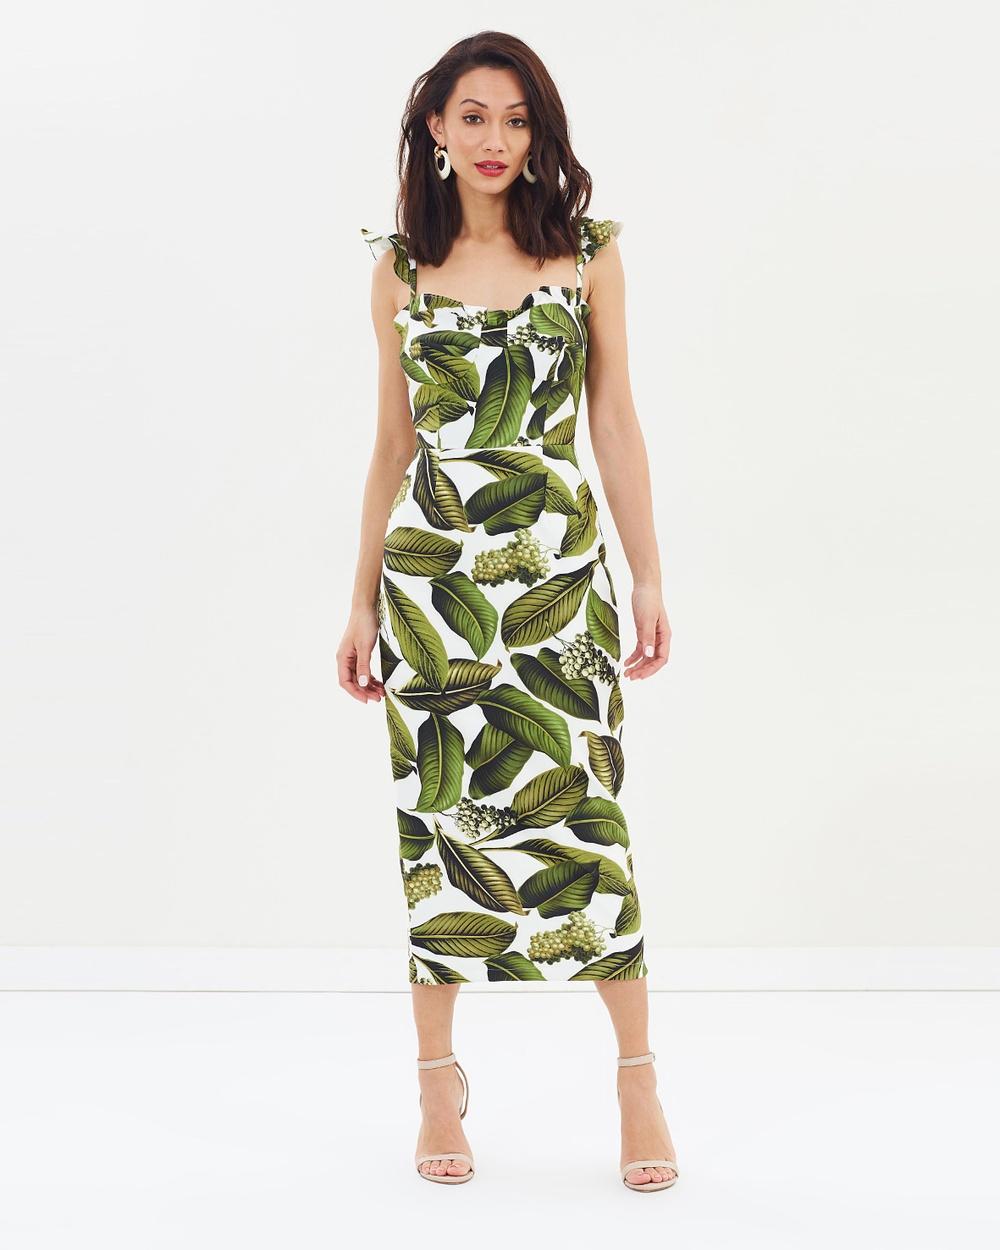 Pasduchas Vineyard Bustier Midi Dress Printed Dresses Leaf Vineyard Bustier Midi Dress